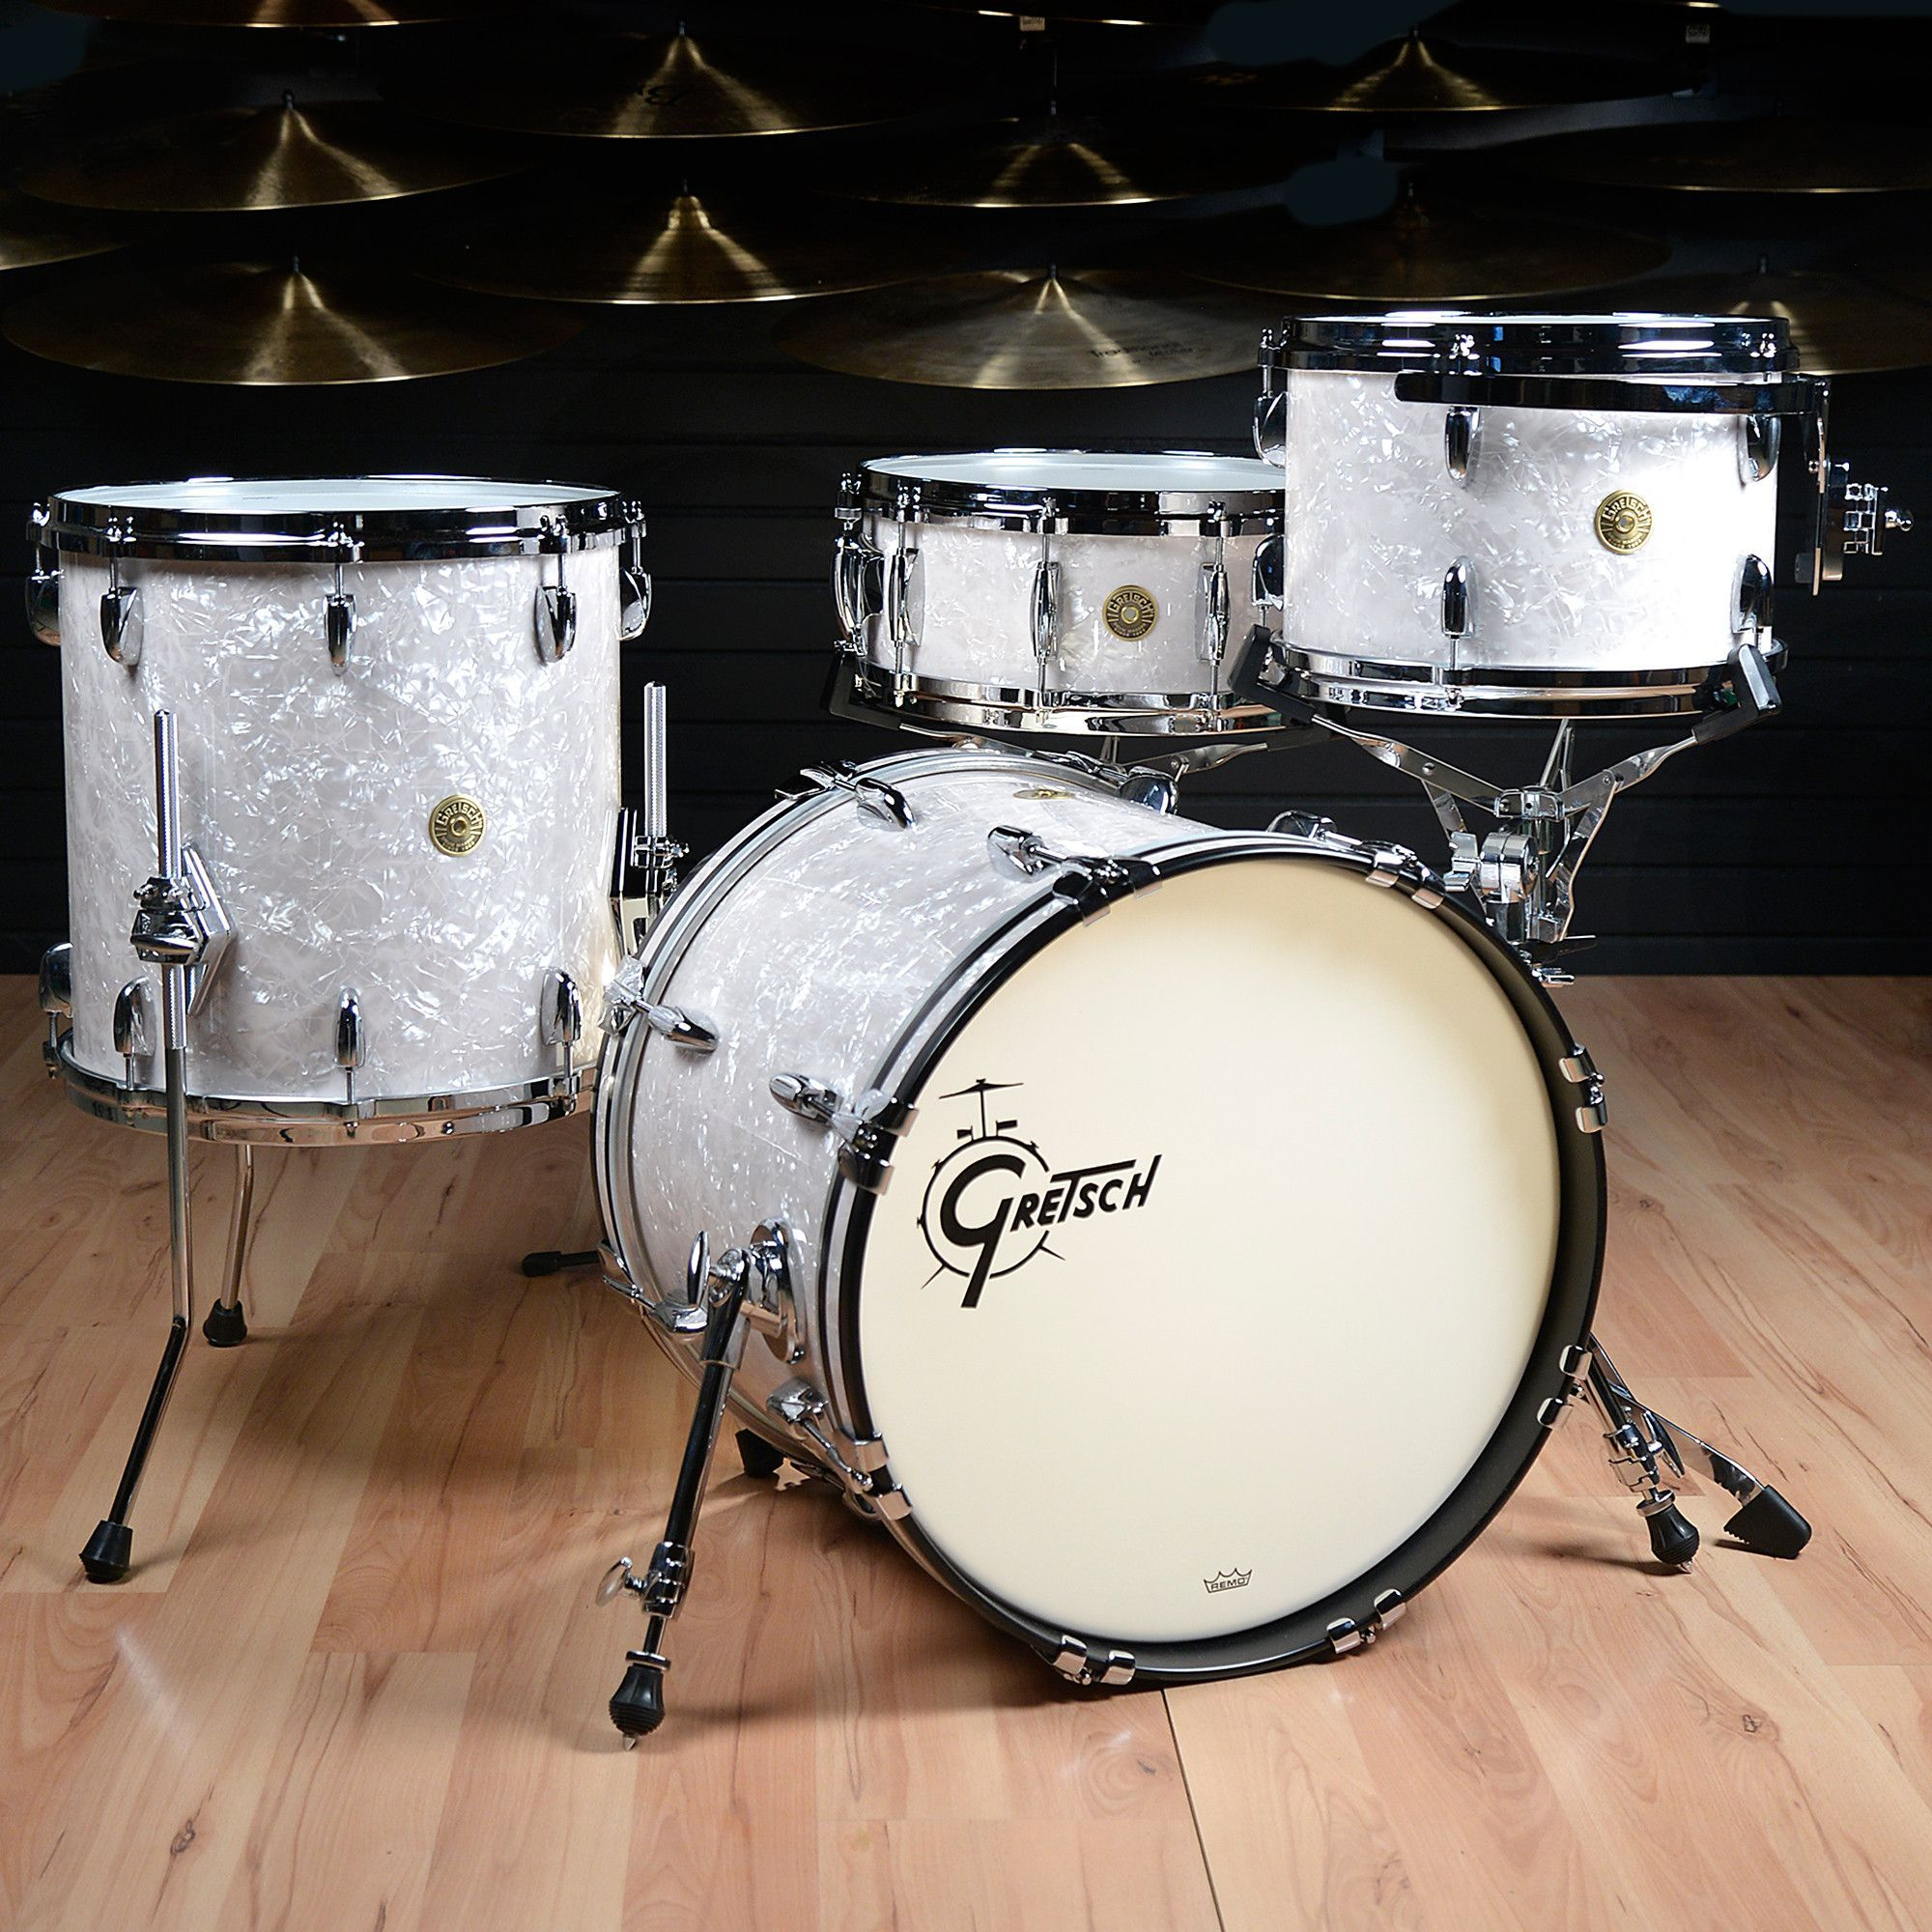 gretsch usa custom 12 14 18 4pc drum kit vintage marine pearl drum dreams pinterest. Black Bedroom Furniture Sets. Home Design Ideas